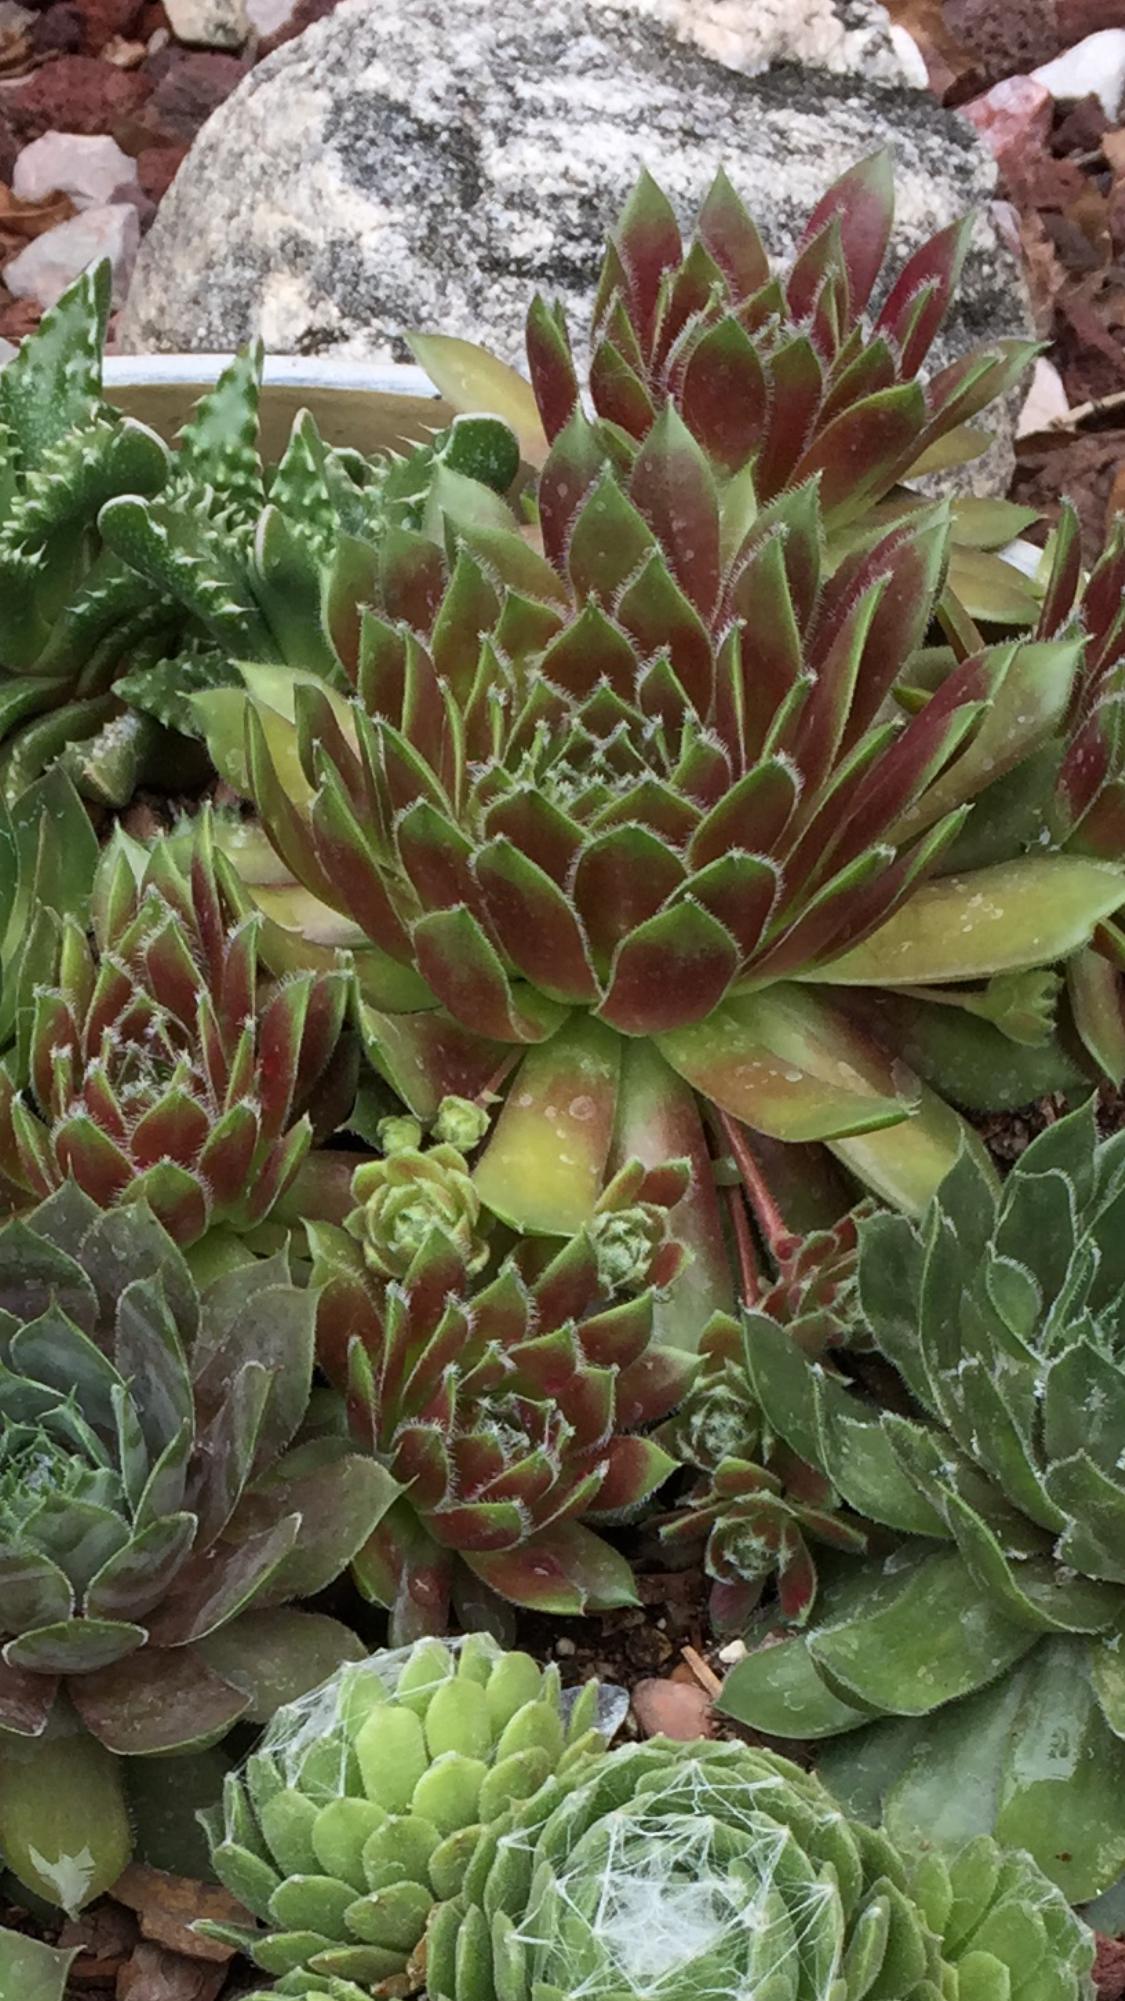 Pin by Melanie on Succulent planters | Pinterest | Cacti, Succulents ...